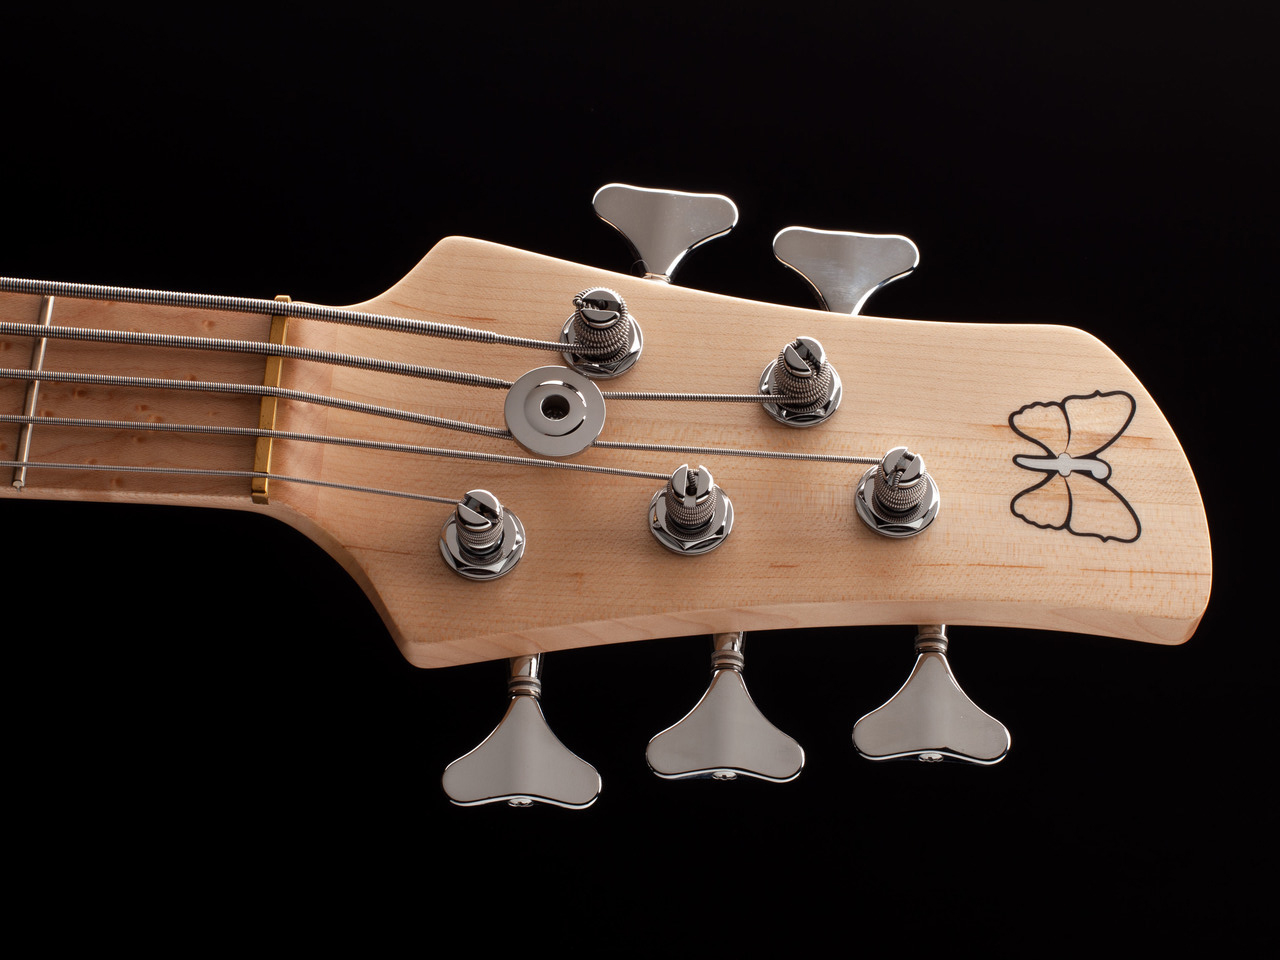 Fodera Emperor-J 5 Standard Classic Bass Headstock